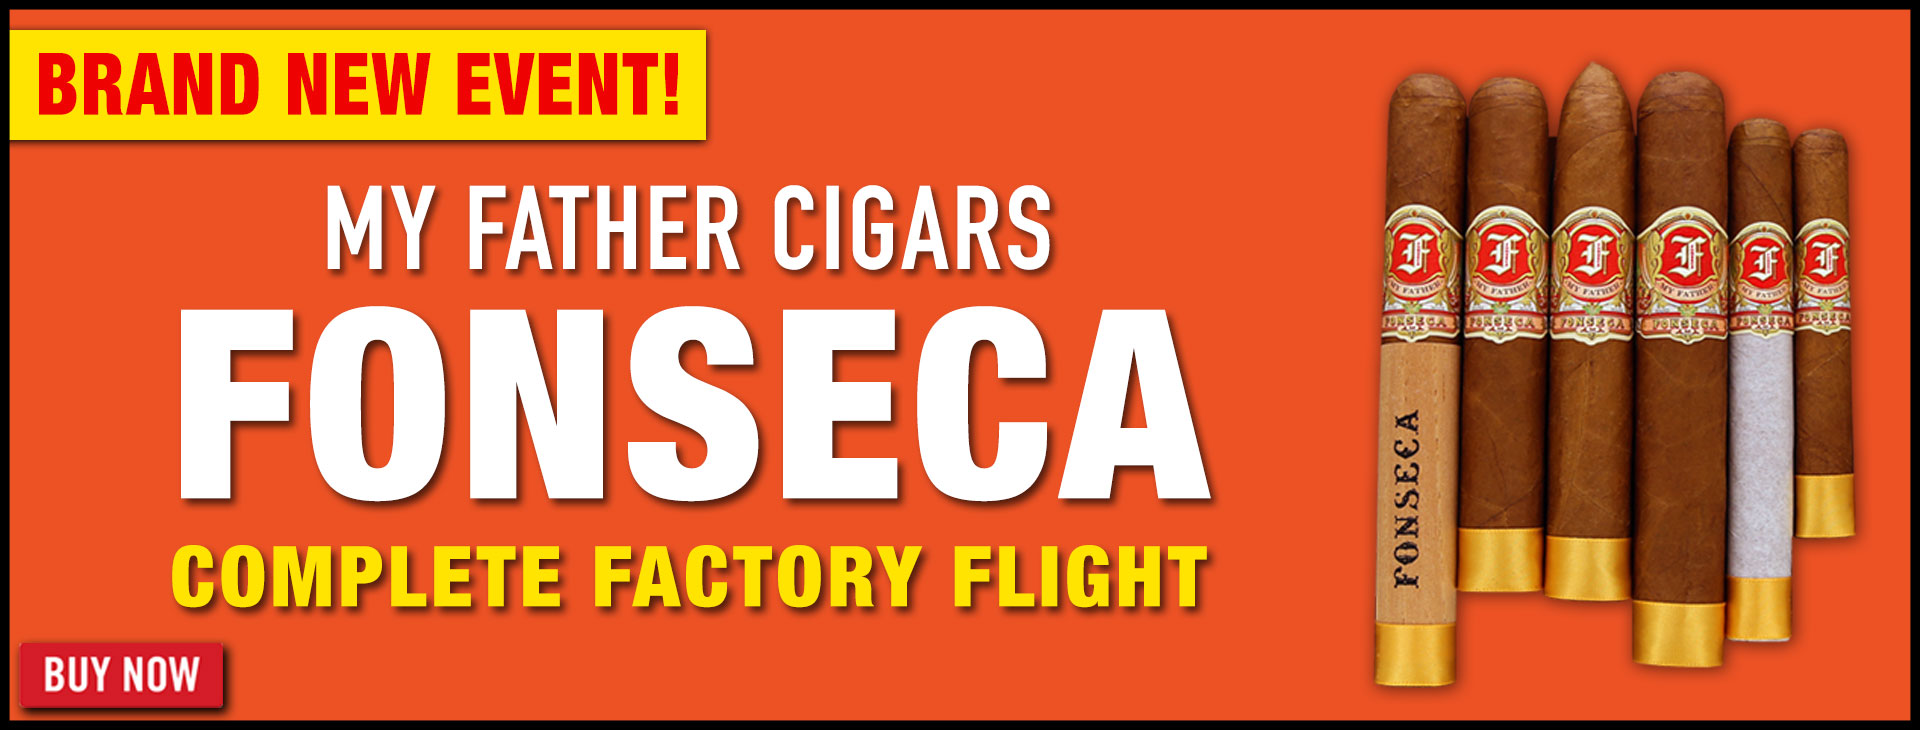 my-father-fonseca-factory-flight-2020-banner.jpg